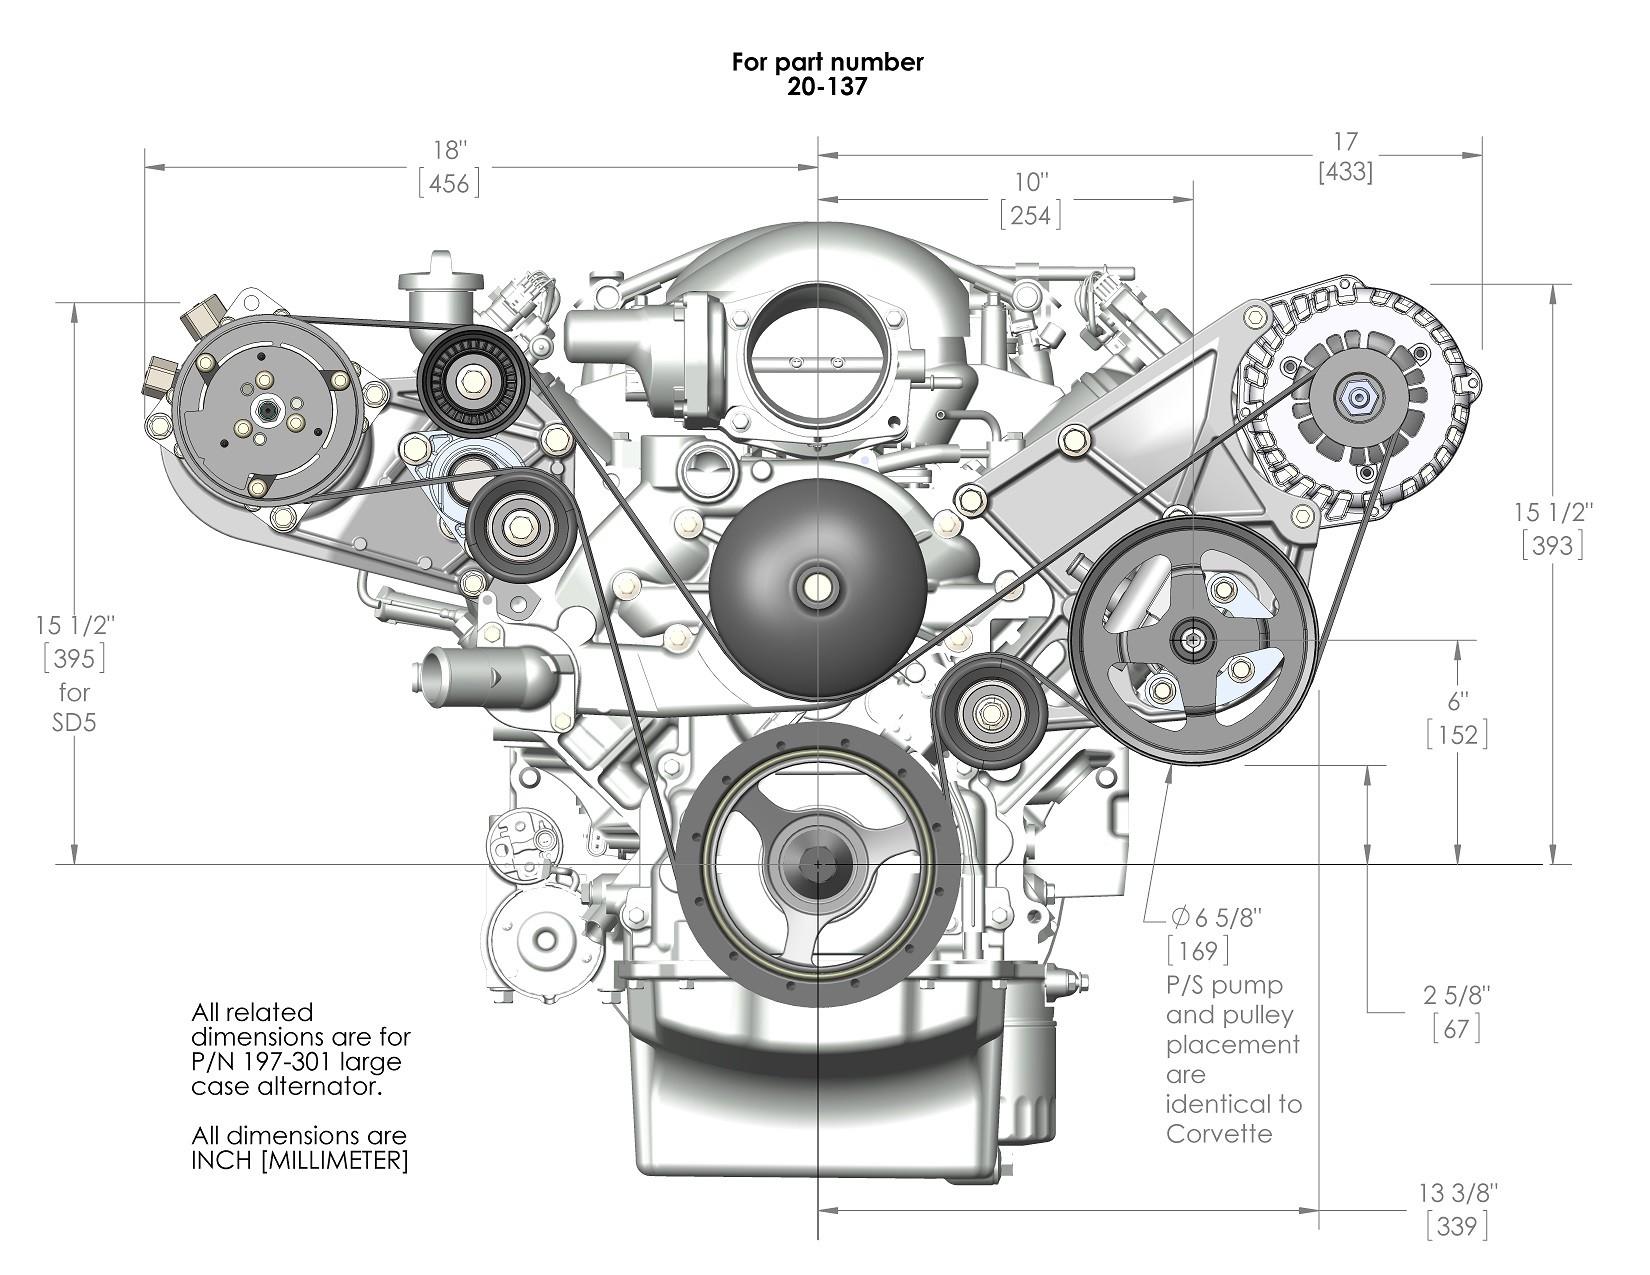 [DIAGRAM_5NL]  BL_3344] Marine 4 3L Vortec Engine Diagram Wiring Diagram | Gm 5 3l Engine Diagram |  | Pneu Venet Bemua Mohammedshrine Librar Wiring 101